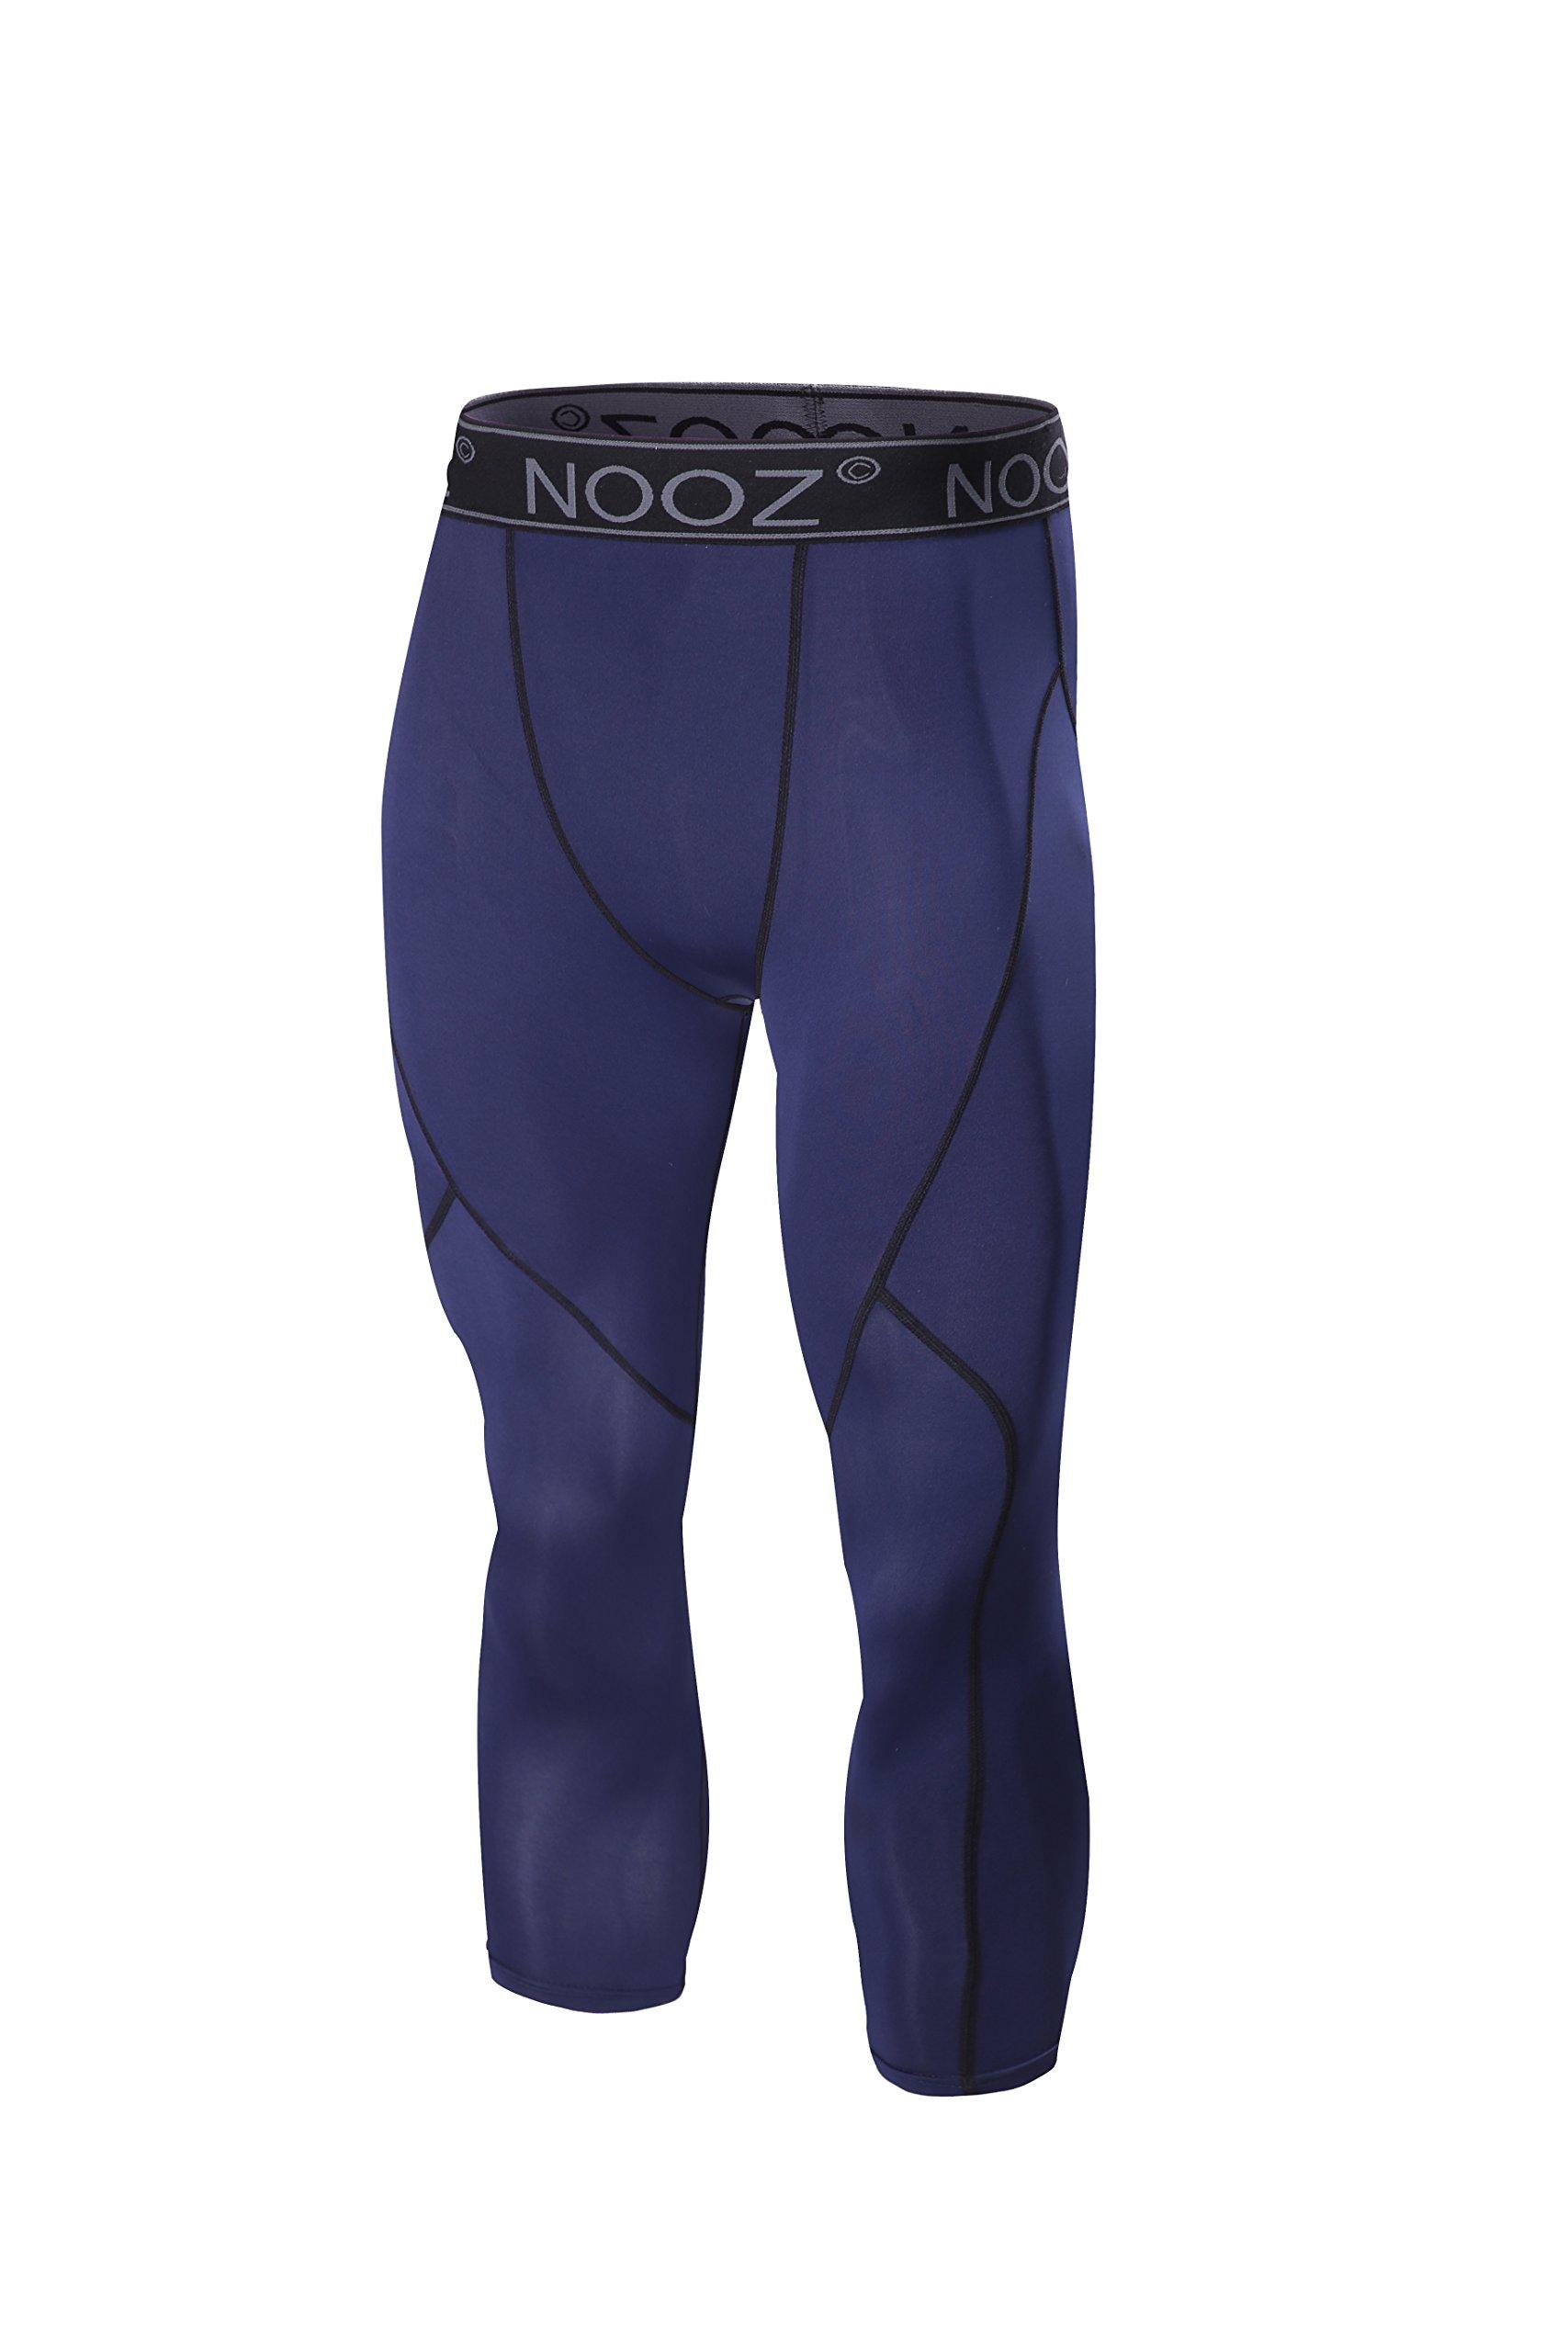 Nooz Men's Cool Dry Compression Ankle Length Capri